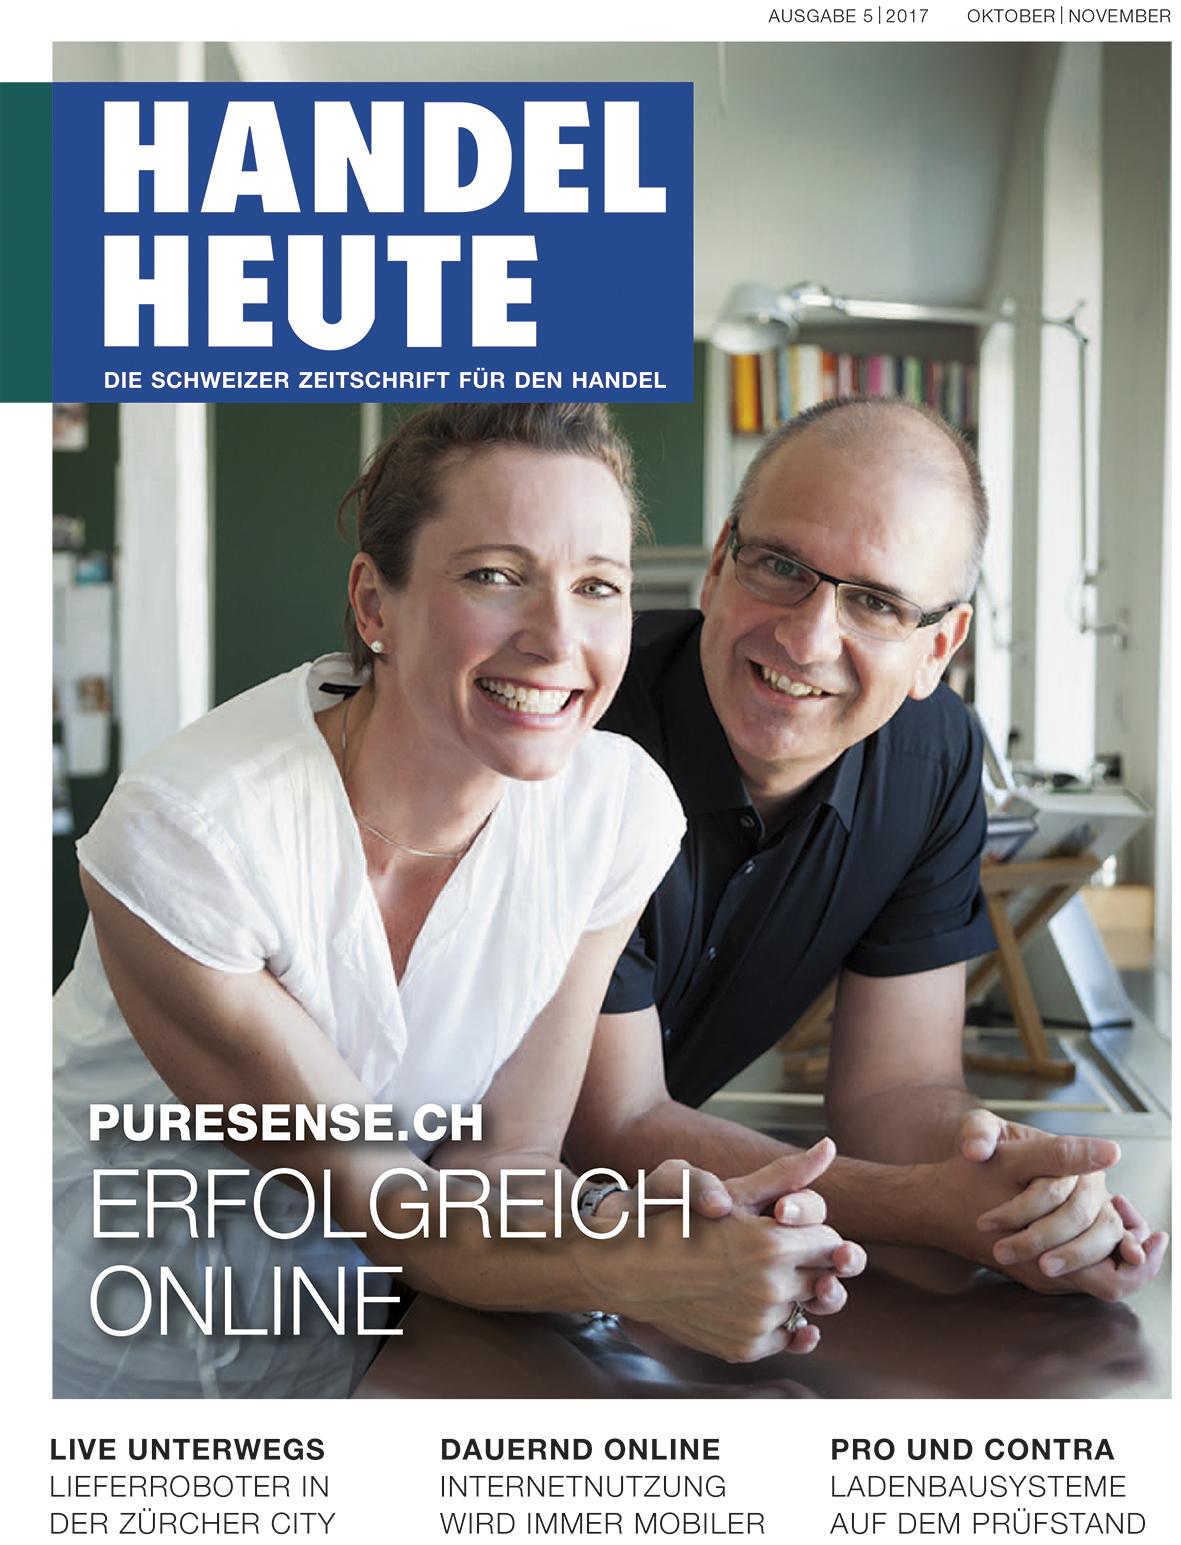 Puresense-Cover-Bild-Handel-heute-KLEIN